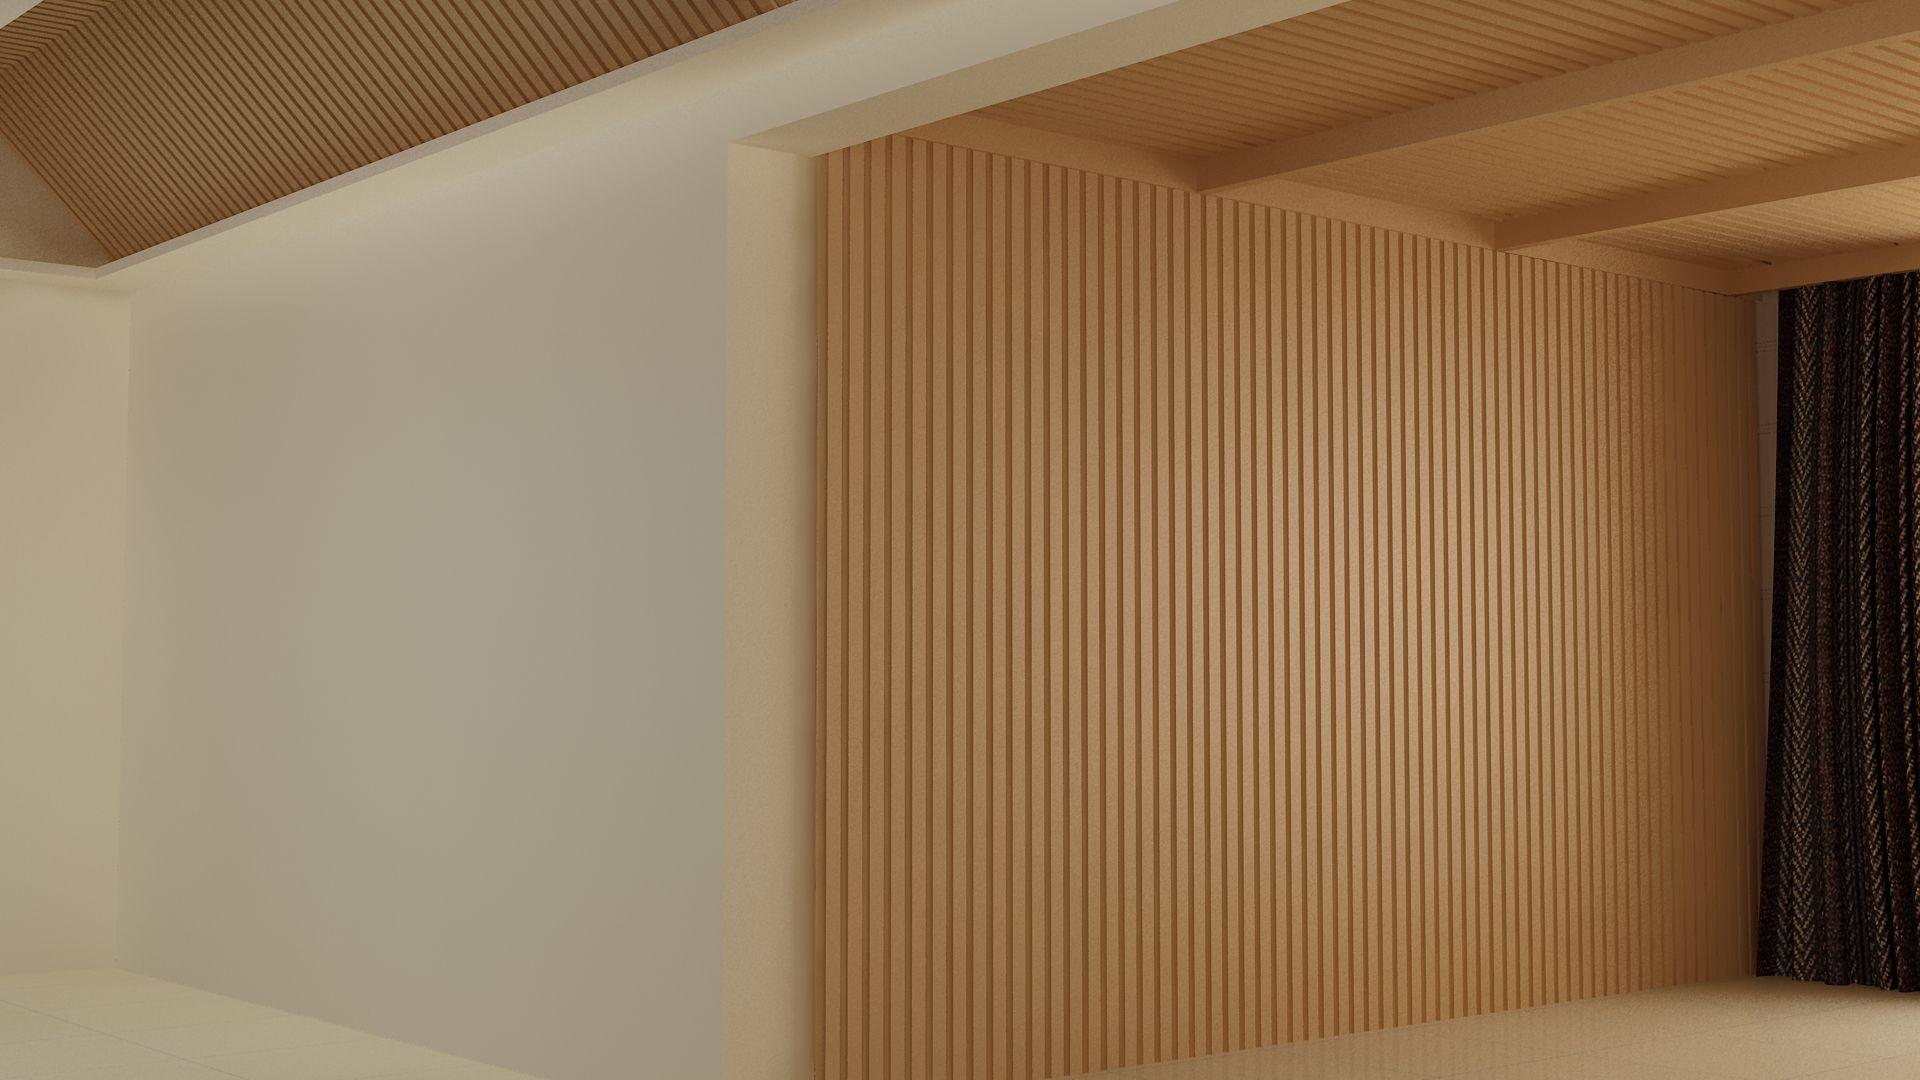 Mission Creek Gazebo Replacement Panels Wall Paneling Outdoor Wall Panels Outdoor Walls